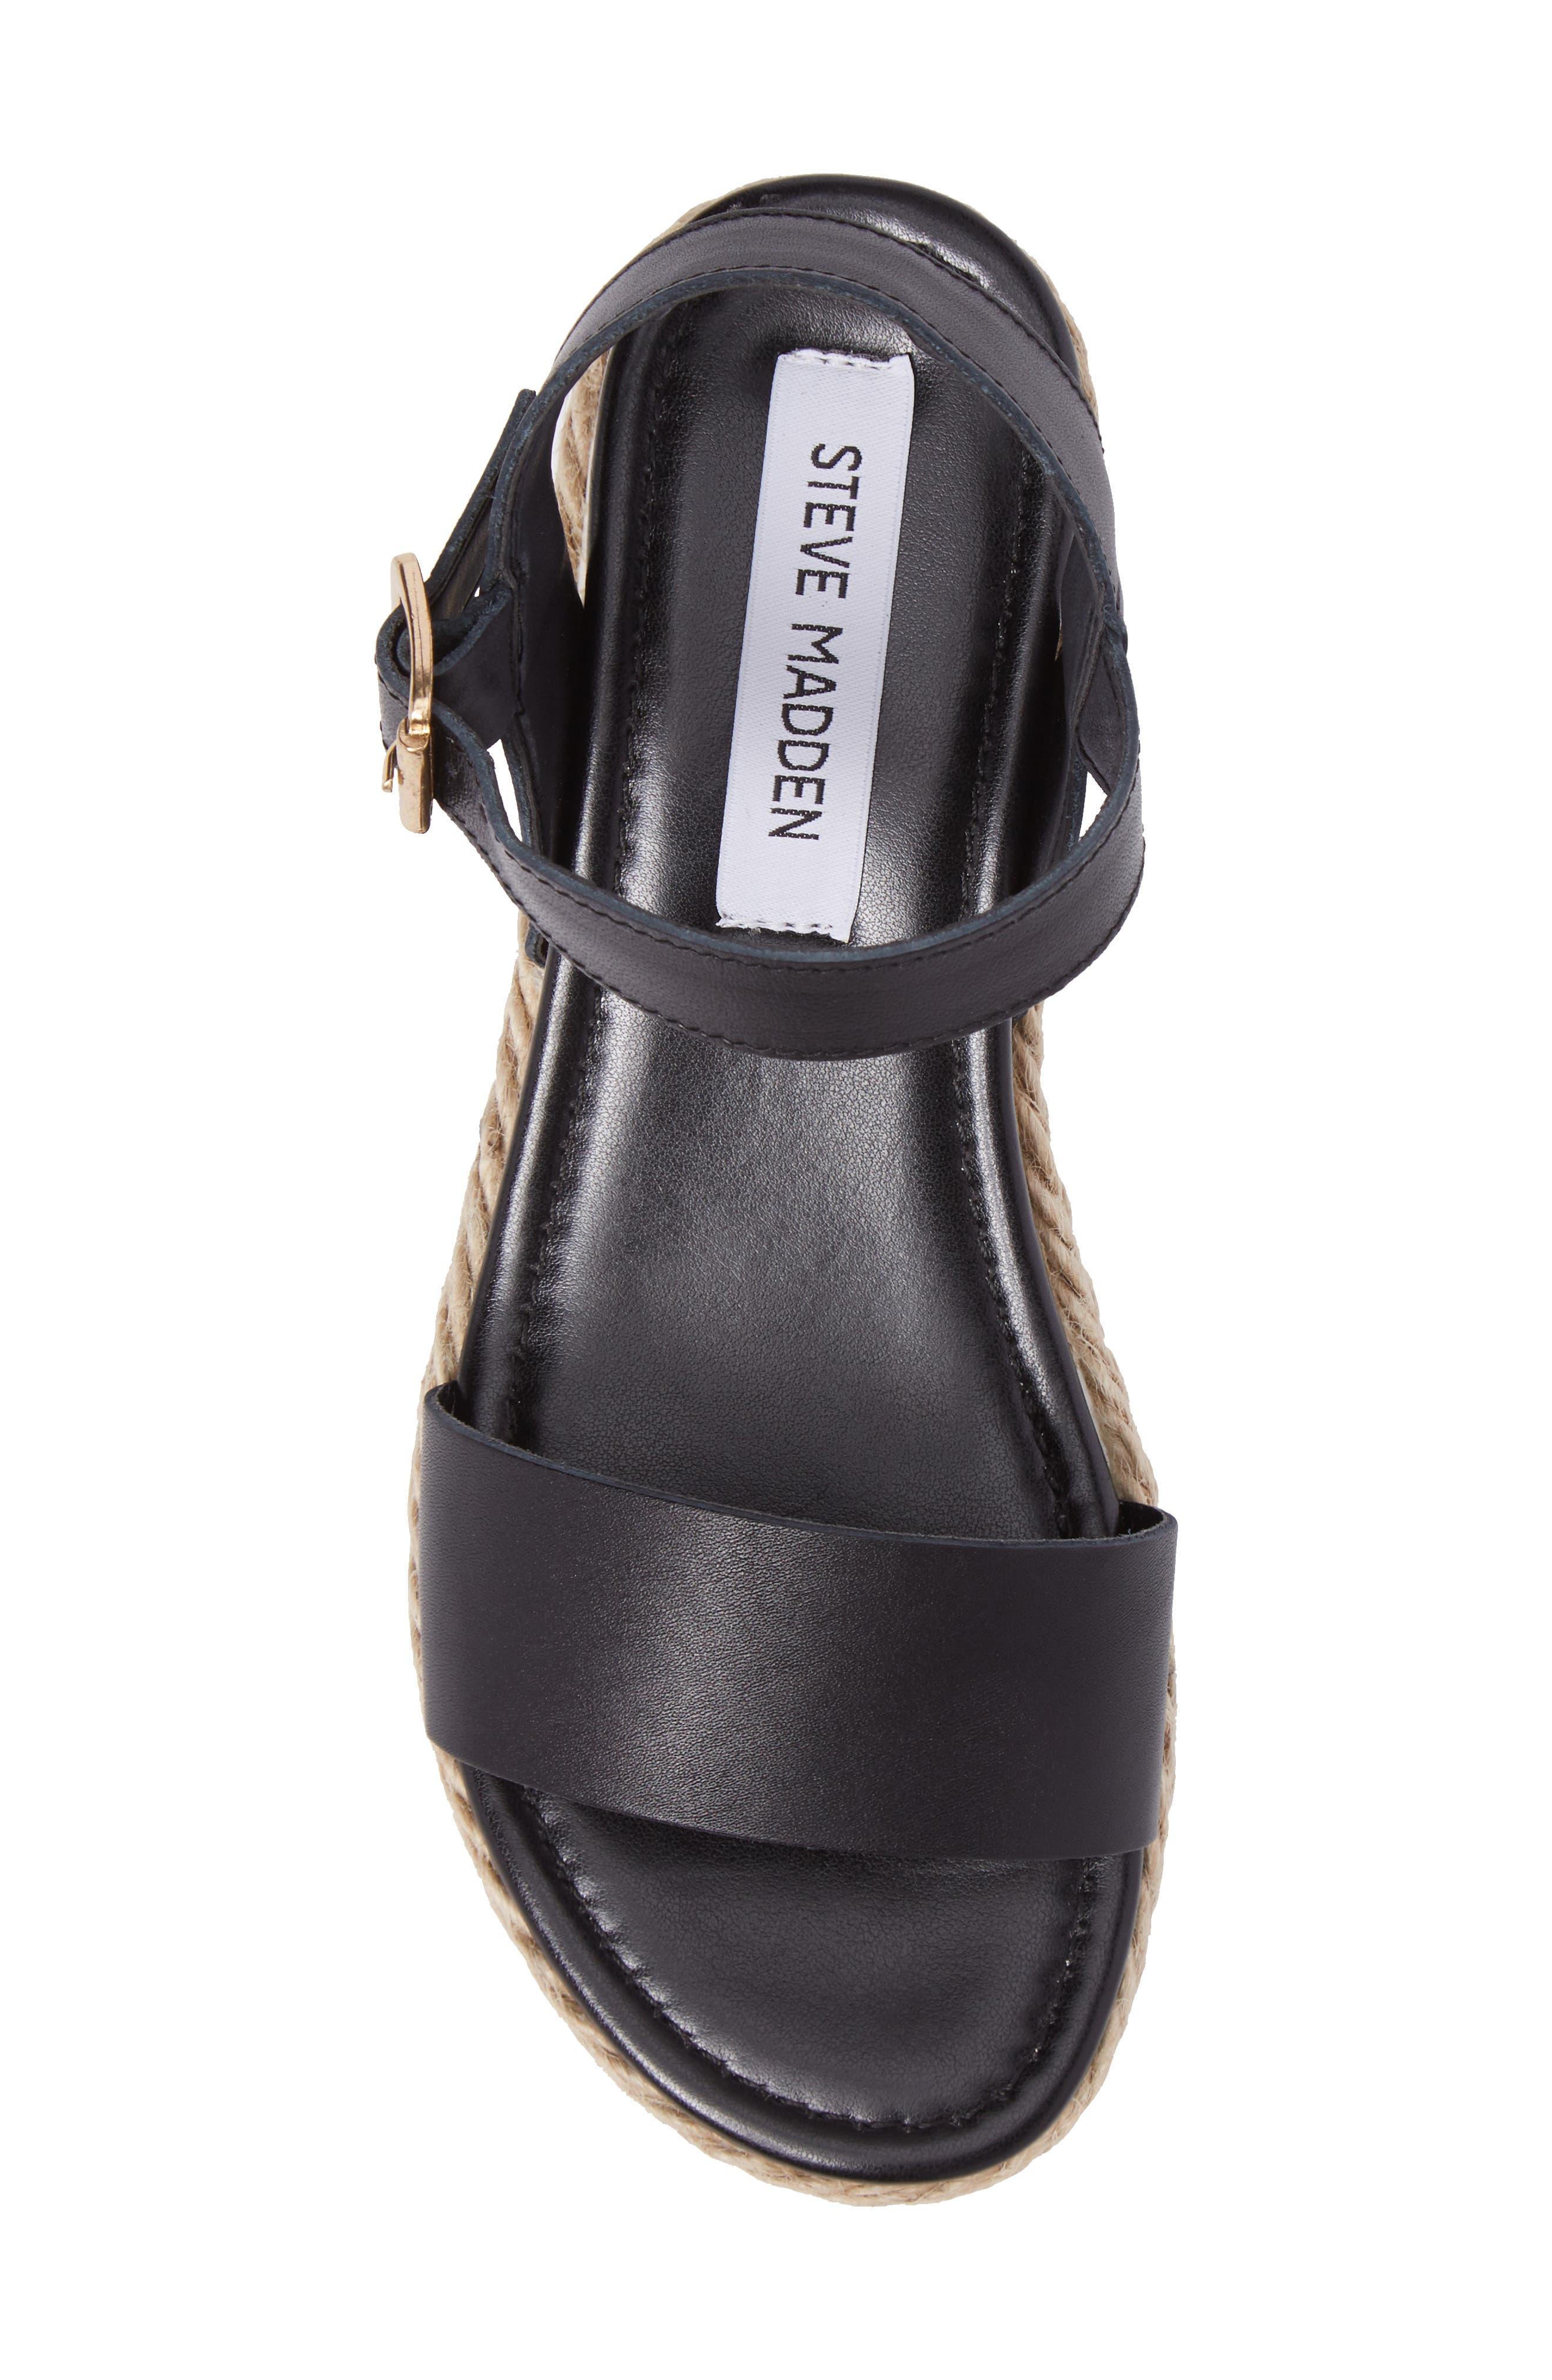 STEVE MADDEN, Chiara Platform Espadrille Sandal, Alternate thumbnail 5, color, BLACK LEATHER